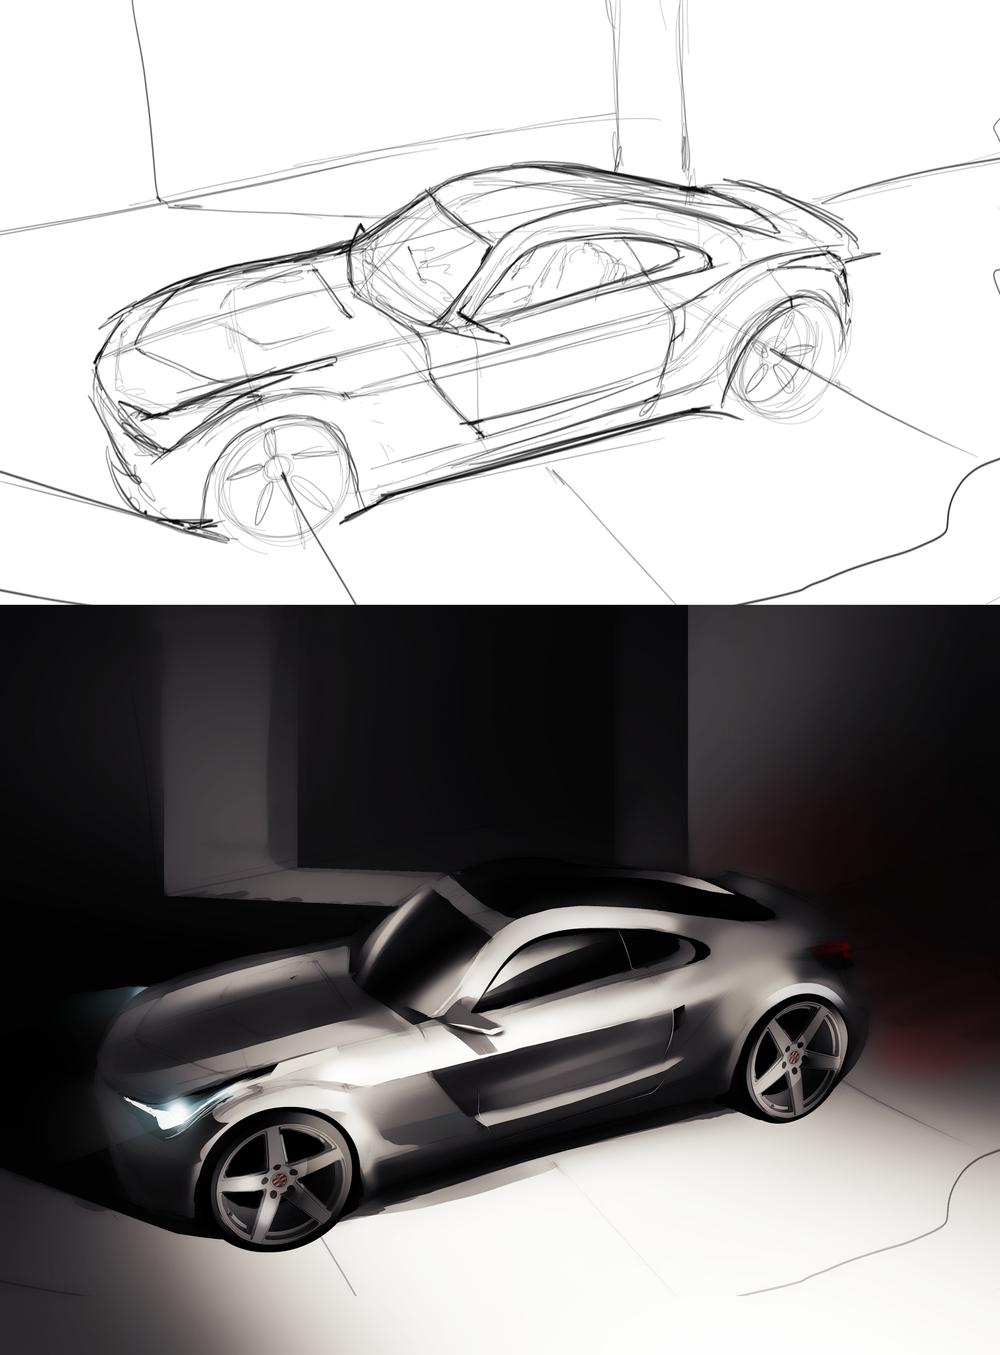 Nissan inspired render